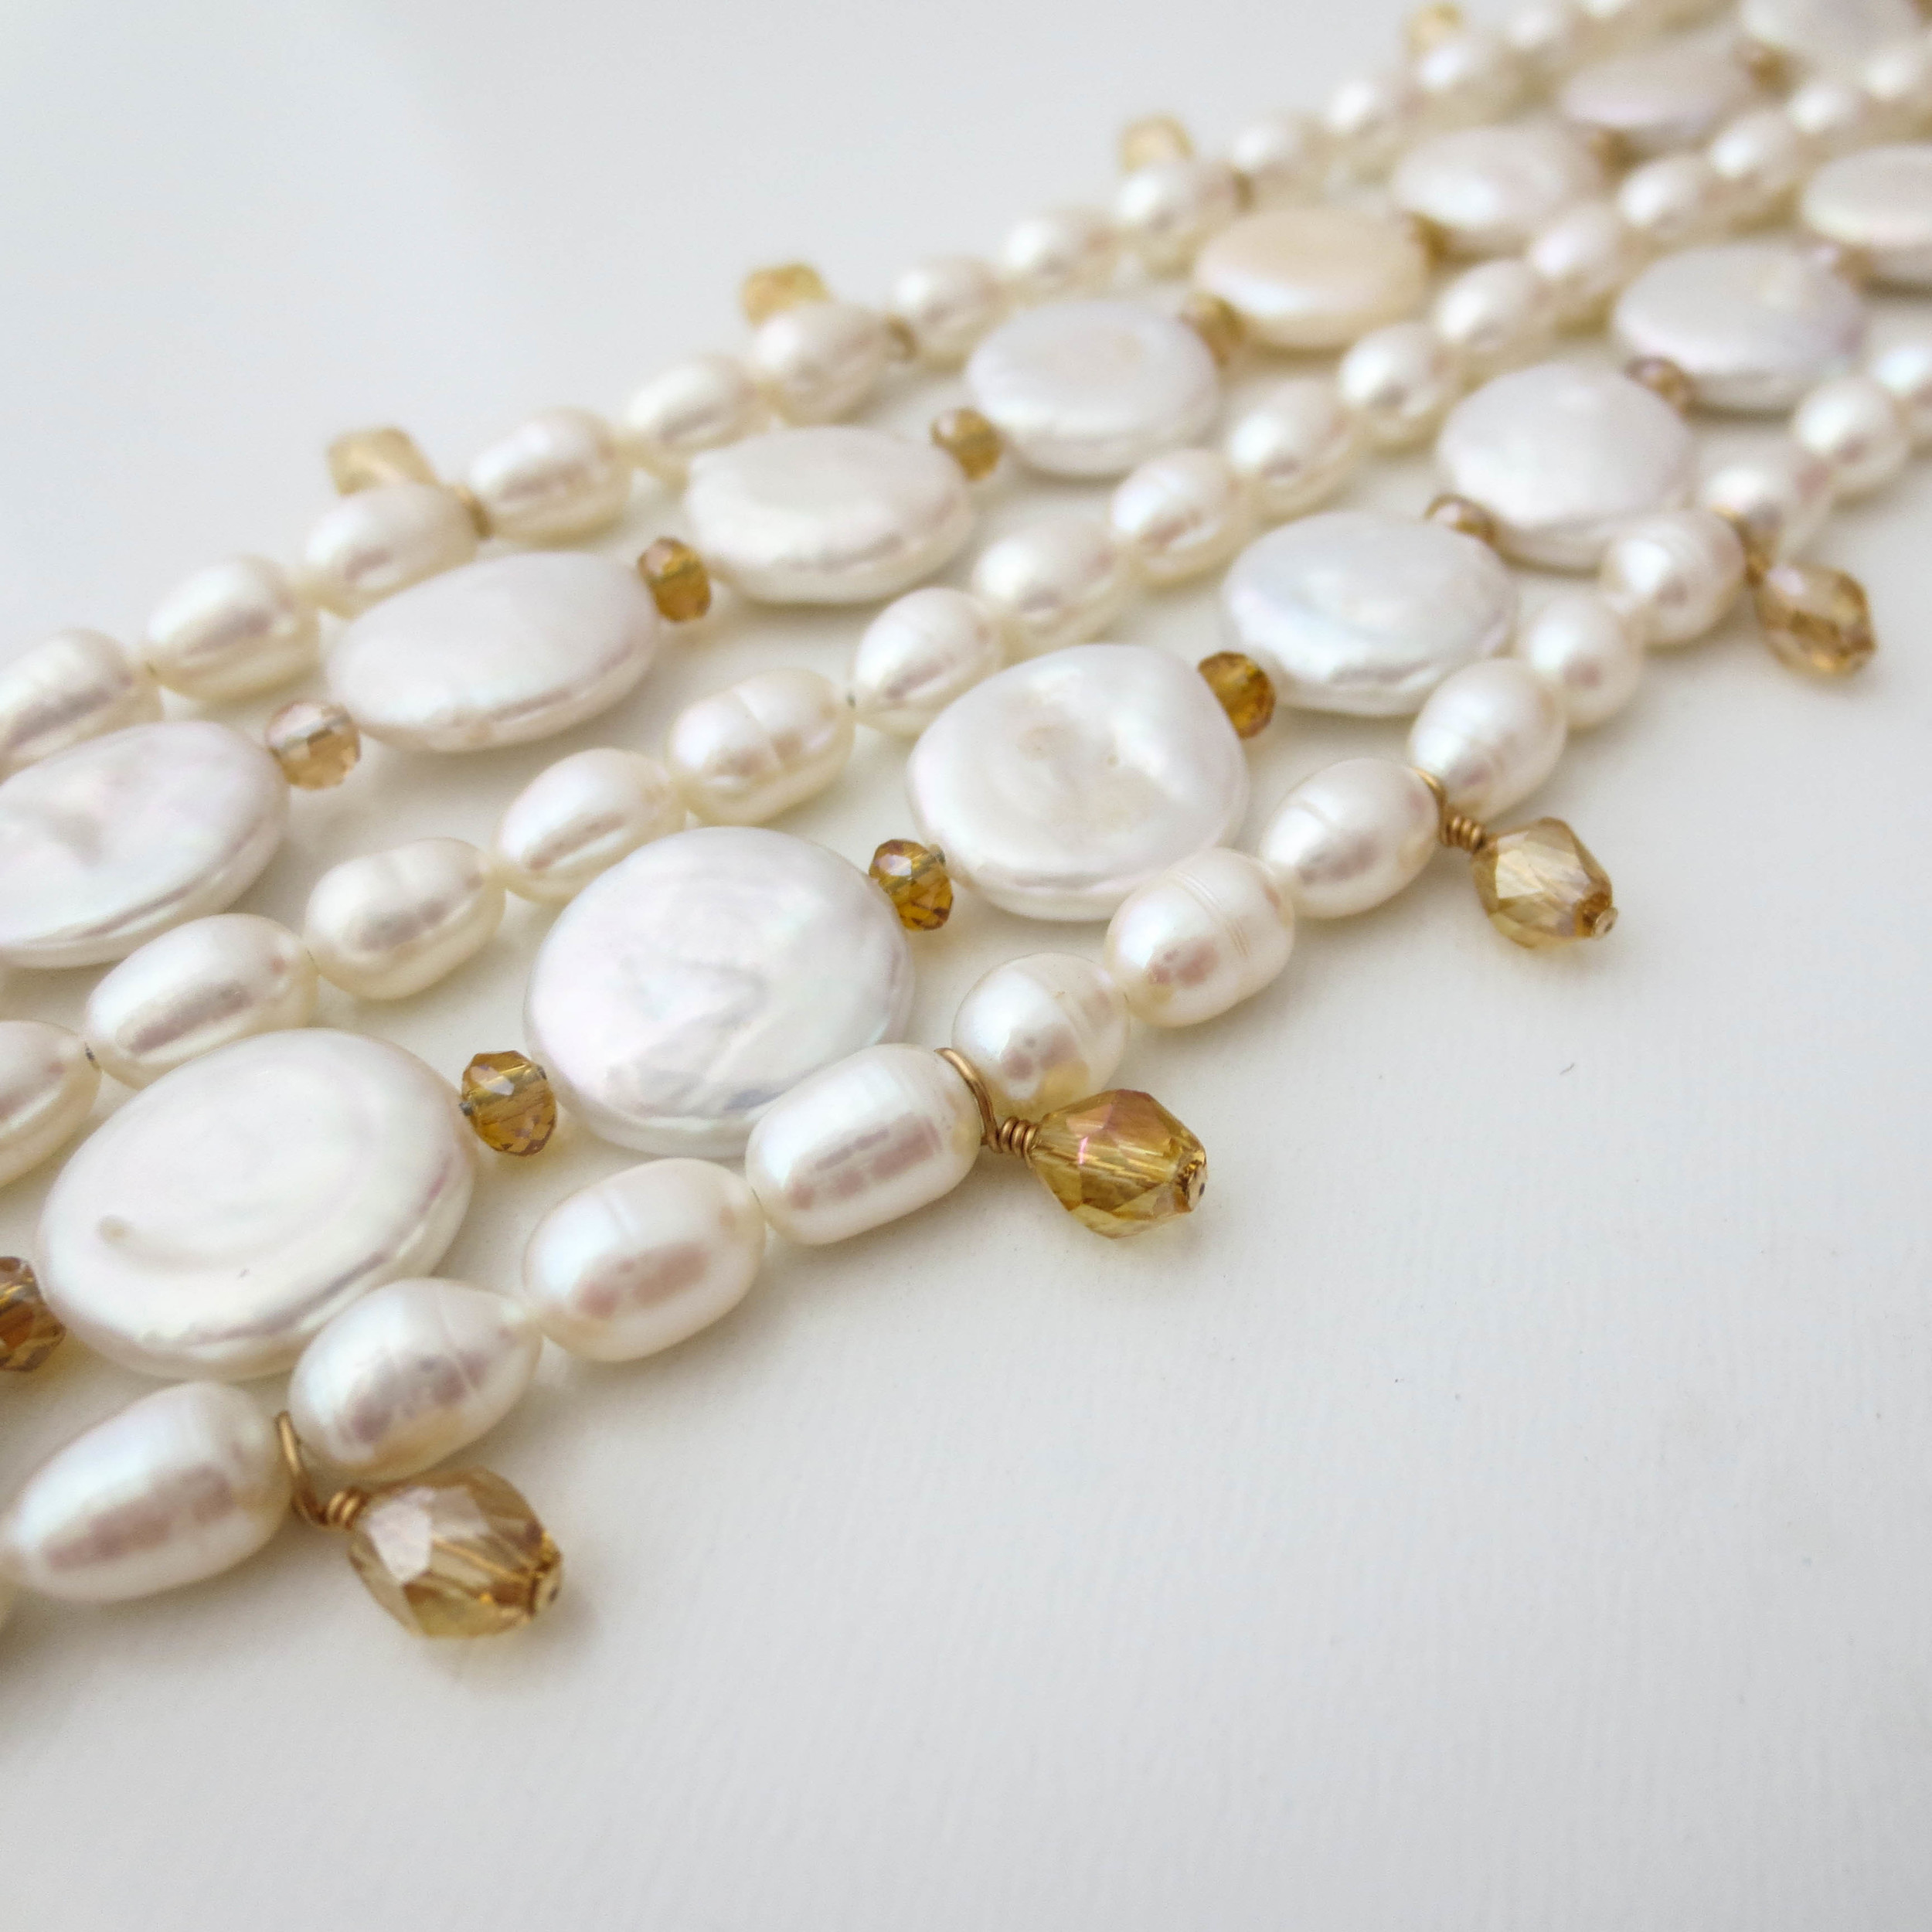 808-pearl-bracelet-2.jpg